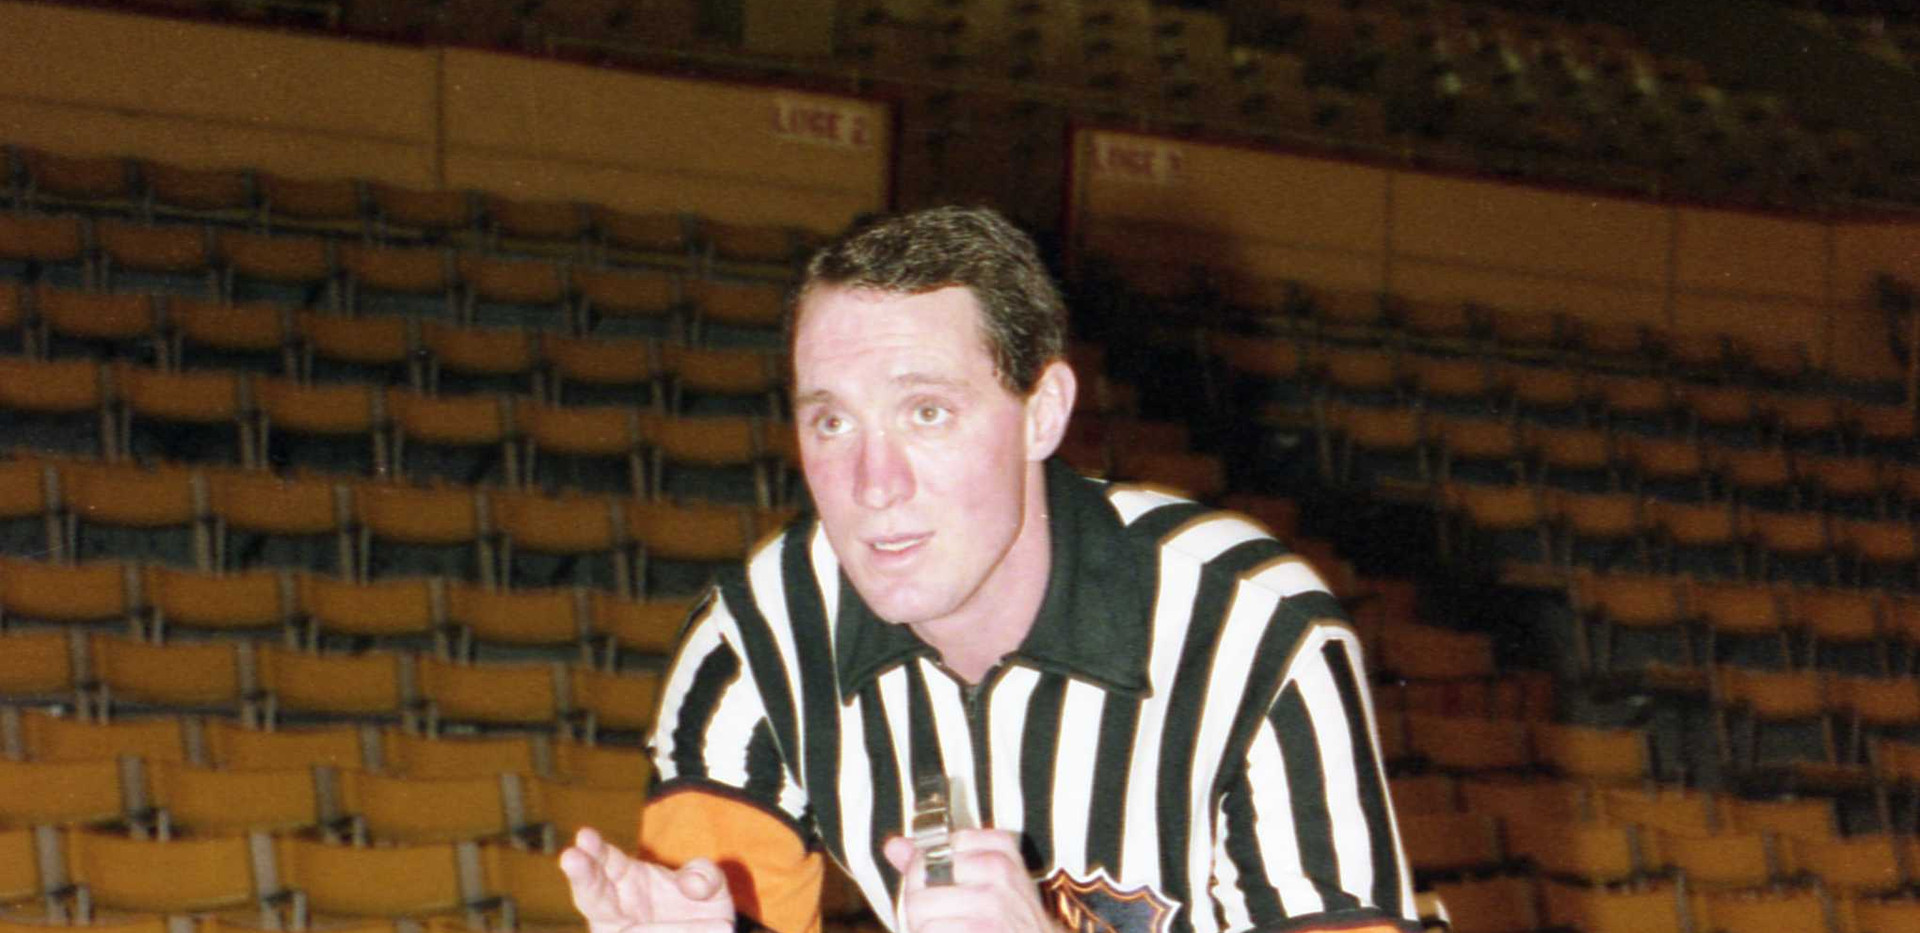 Paul Stewart011.jpg